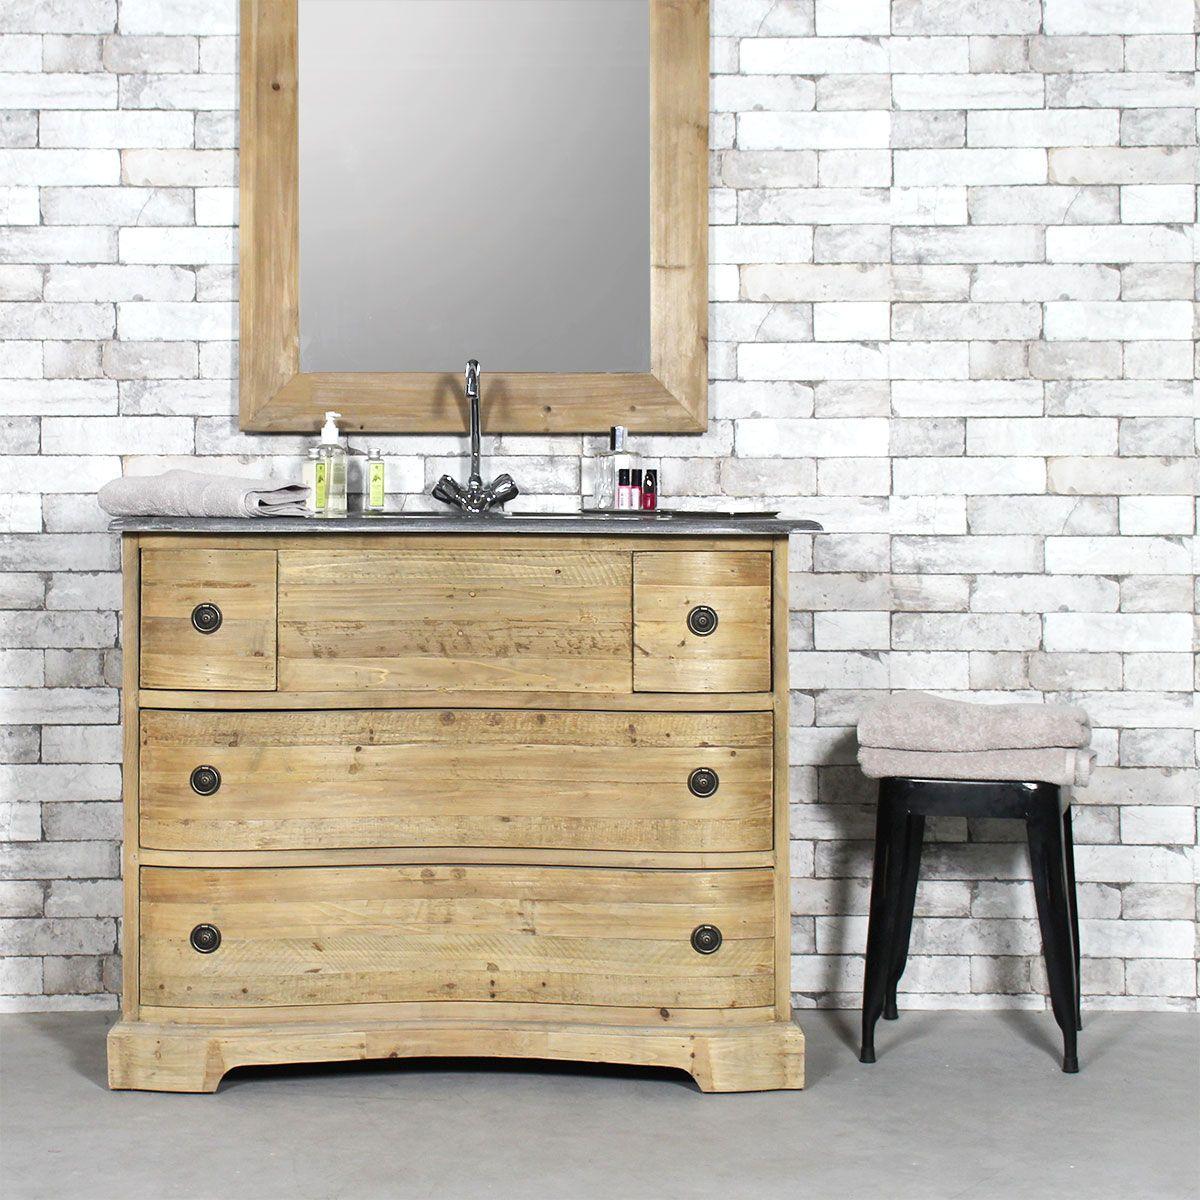 Meuble Salle De Bain Vasque Pierre ~ meuble salle de bain bois massif 1 vasque authentiq meuble salle